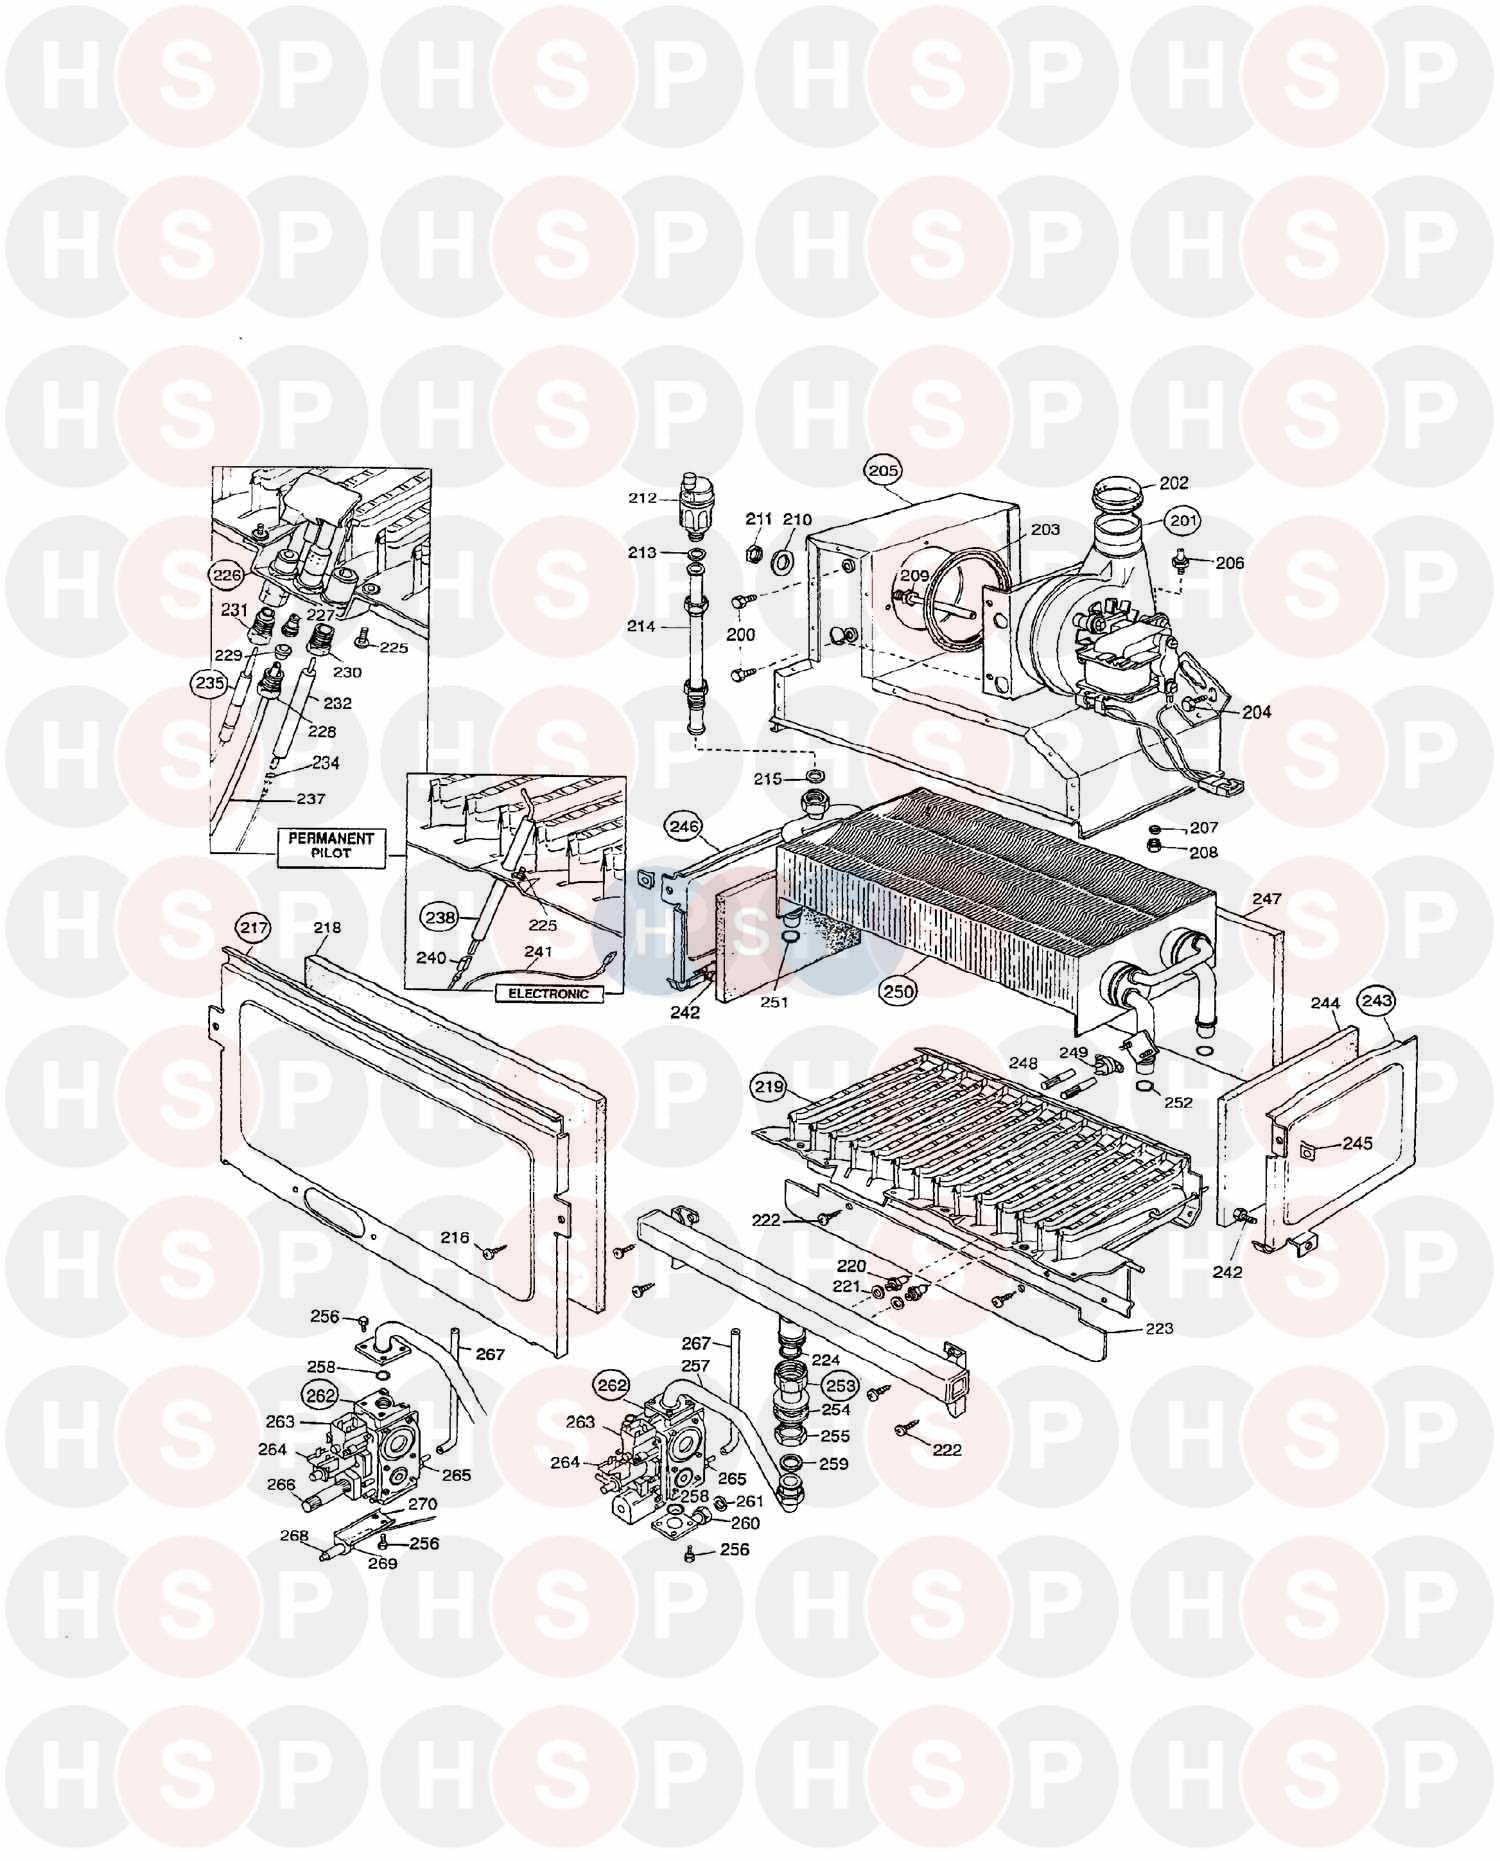 Potterton PUMA 80 E (SIT) Appliance Diagram (Boiler & Gas